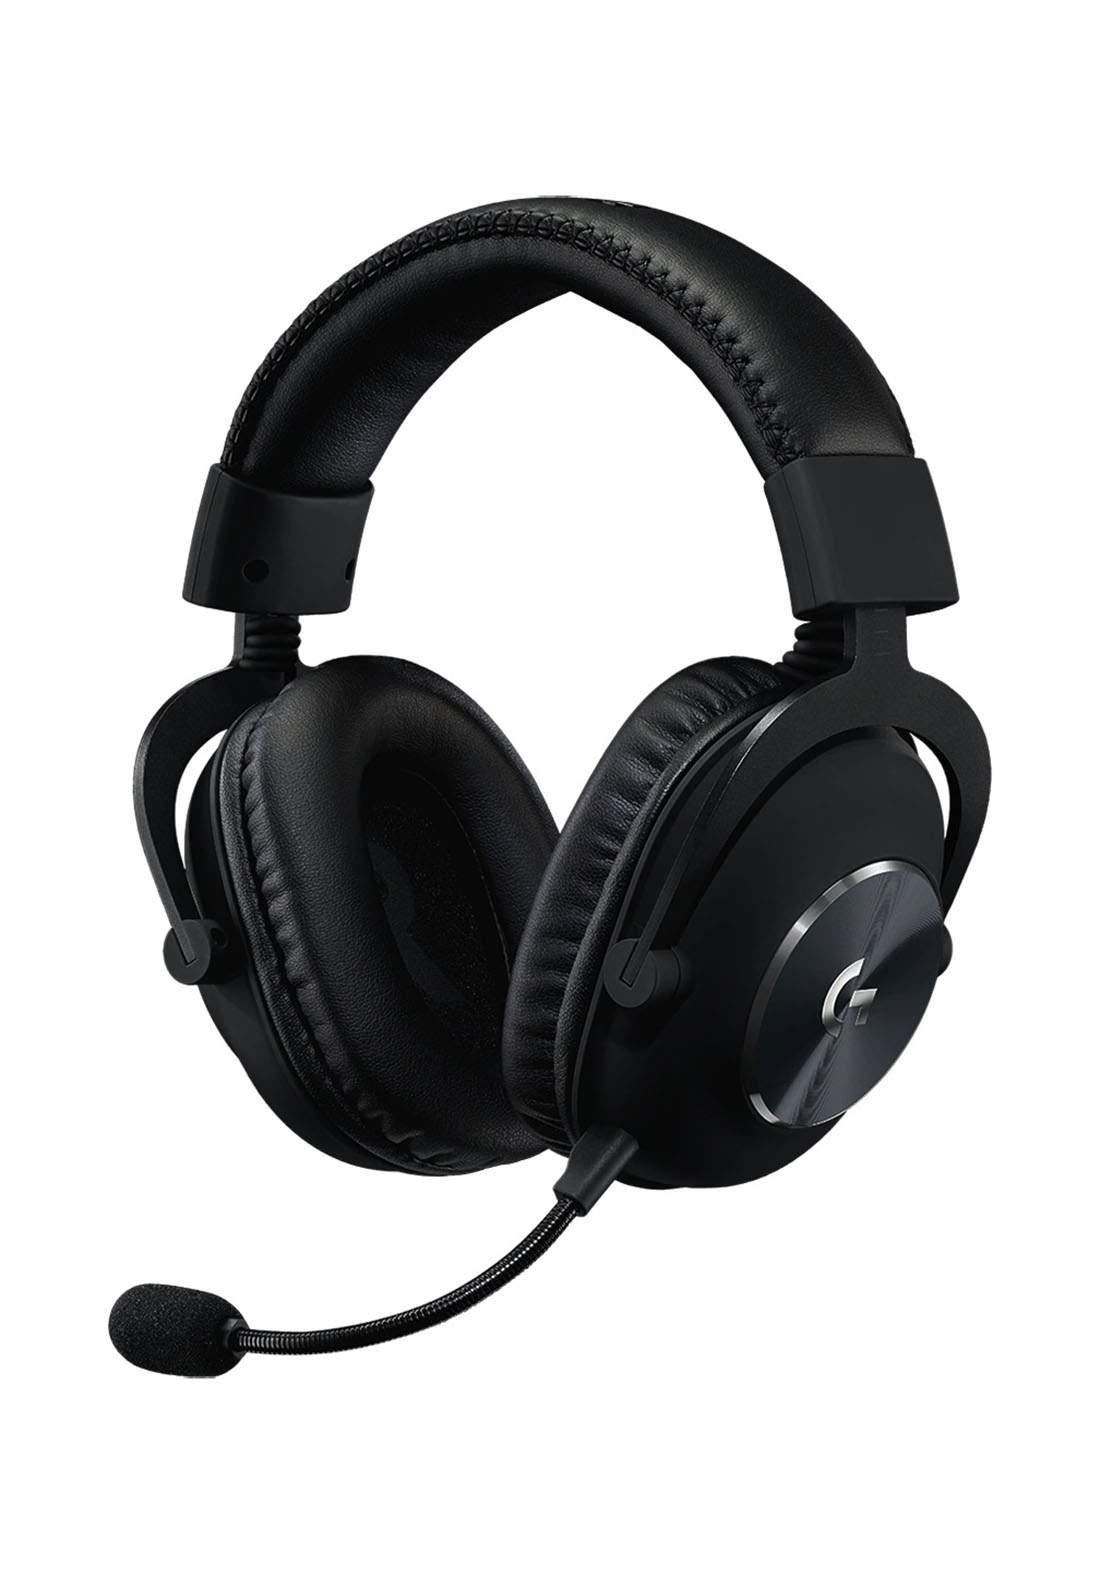 Logitech PRO X Wired Gaming Headset - Black سماعة